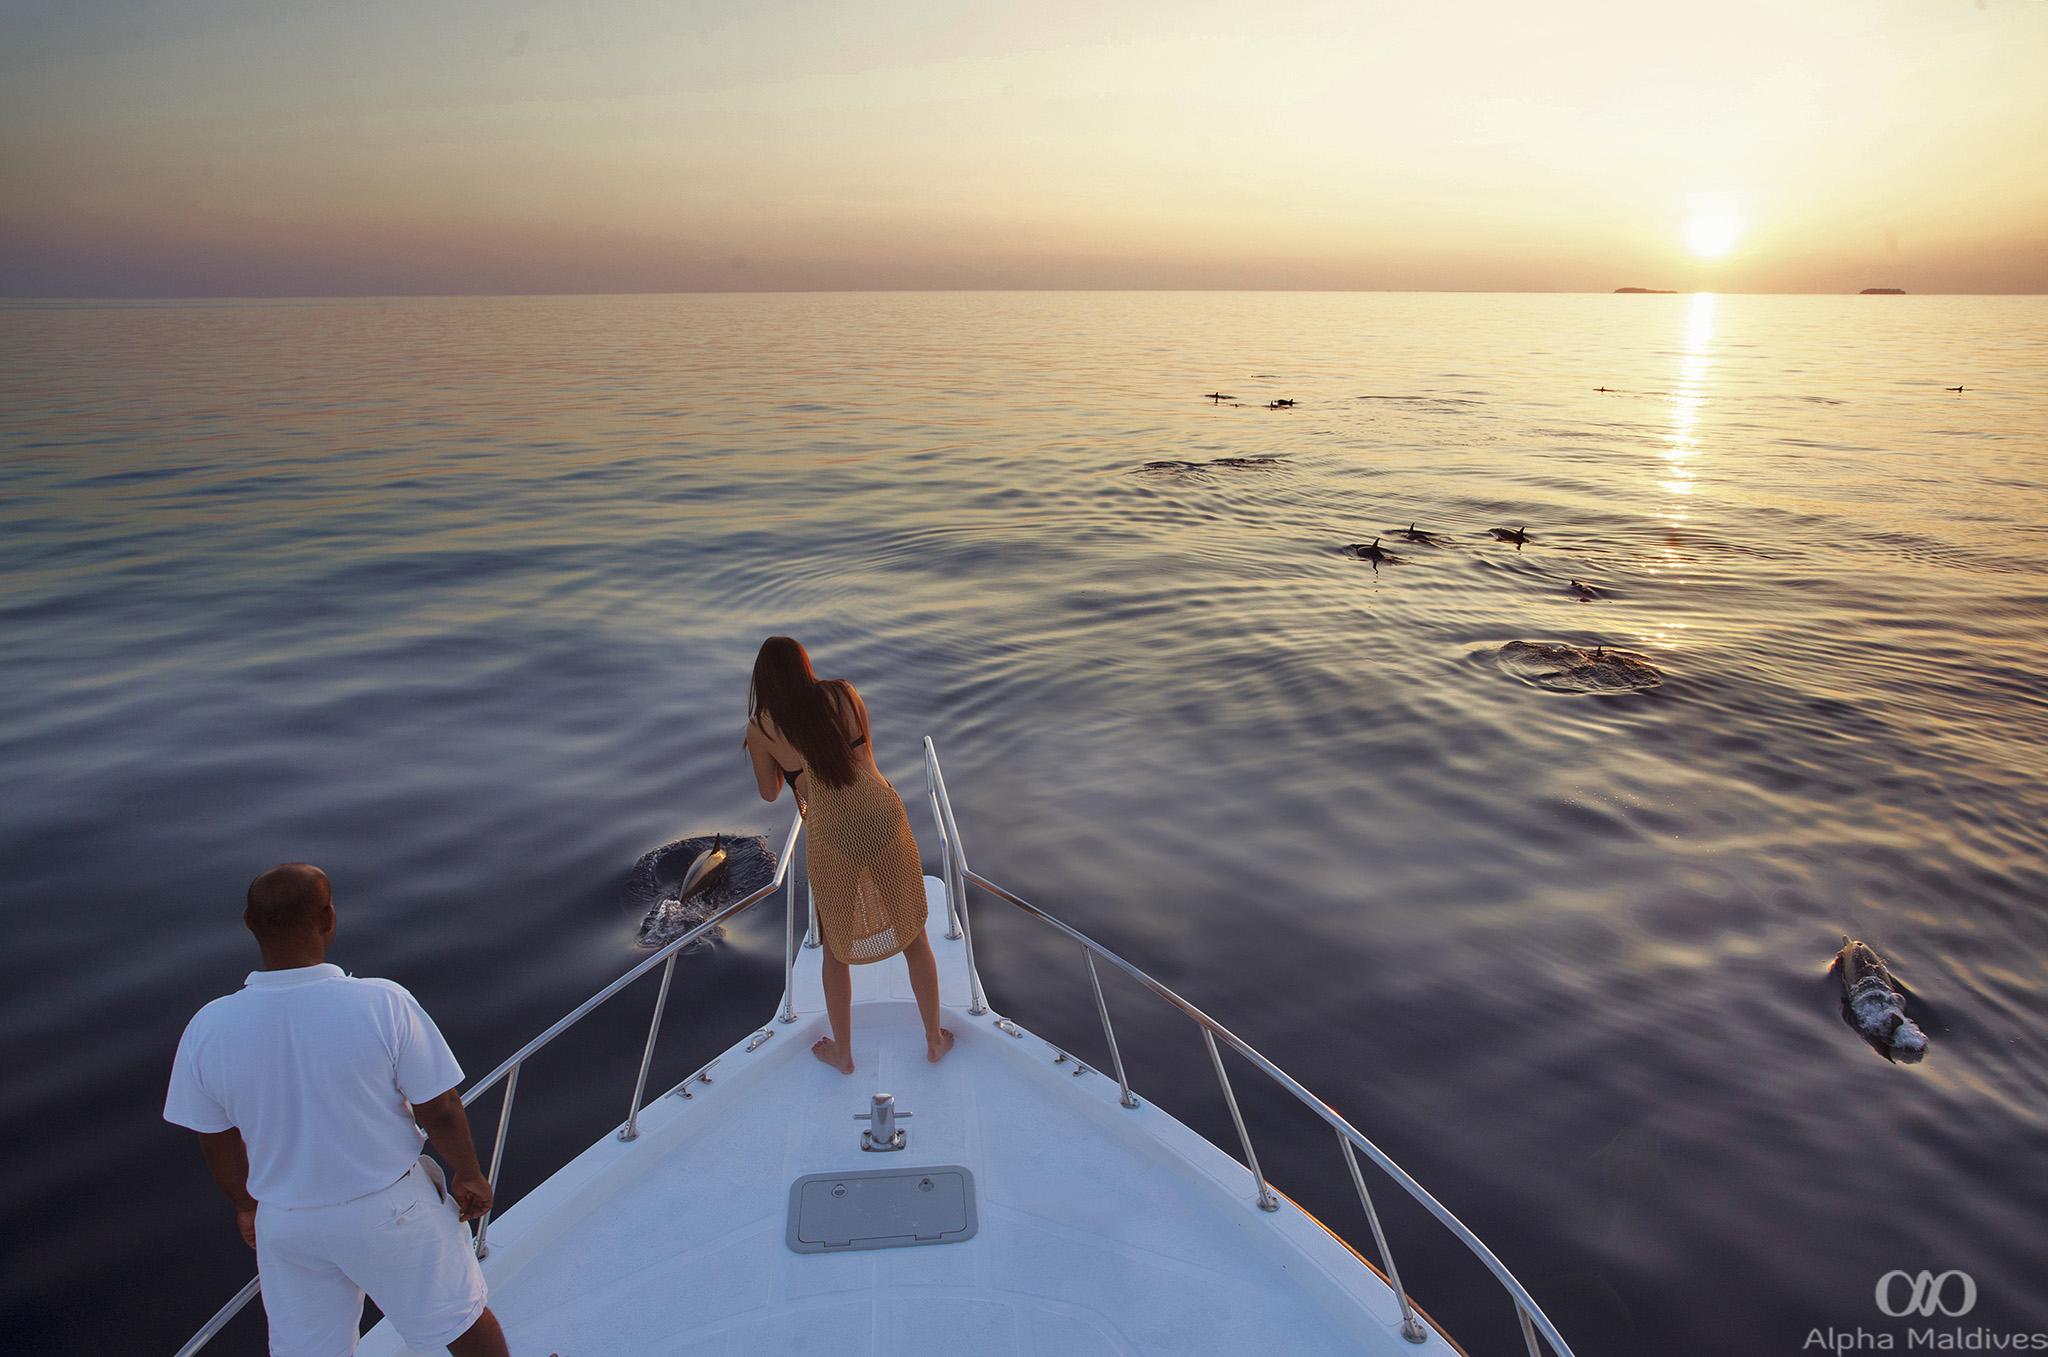 Dolphin Cruise - Soneva Fushi, Maldives by Dan Kullberg